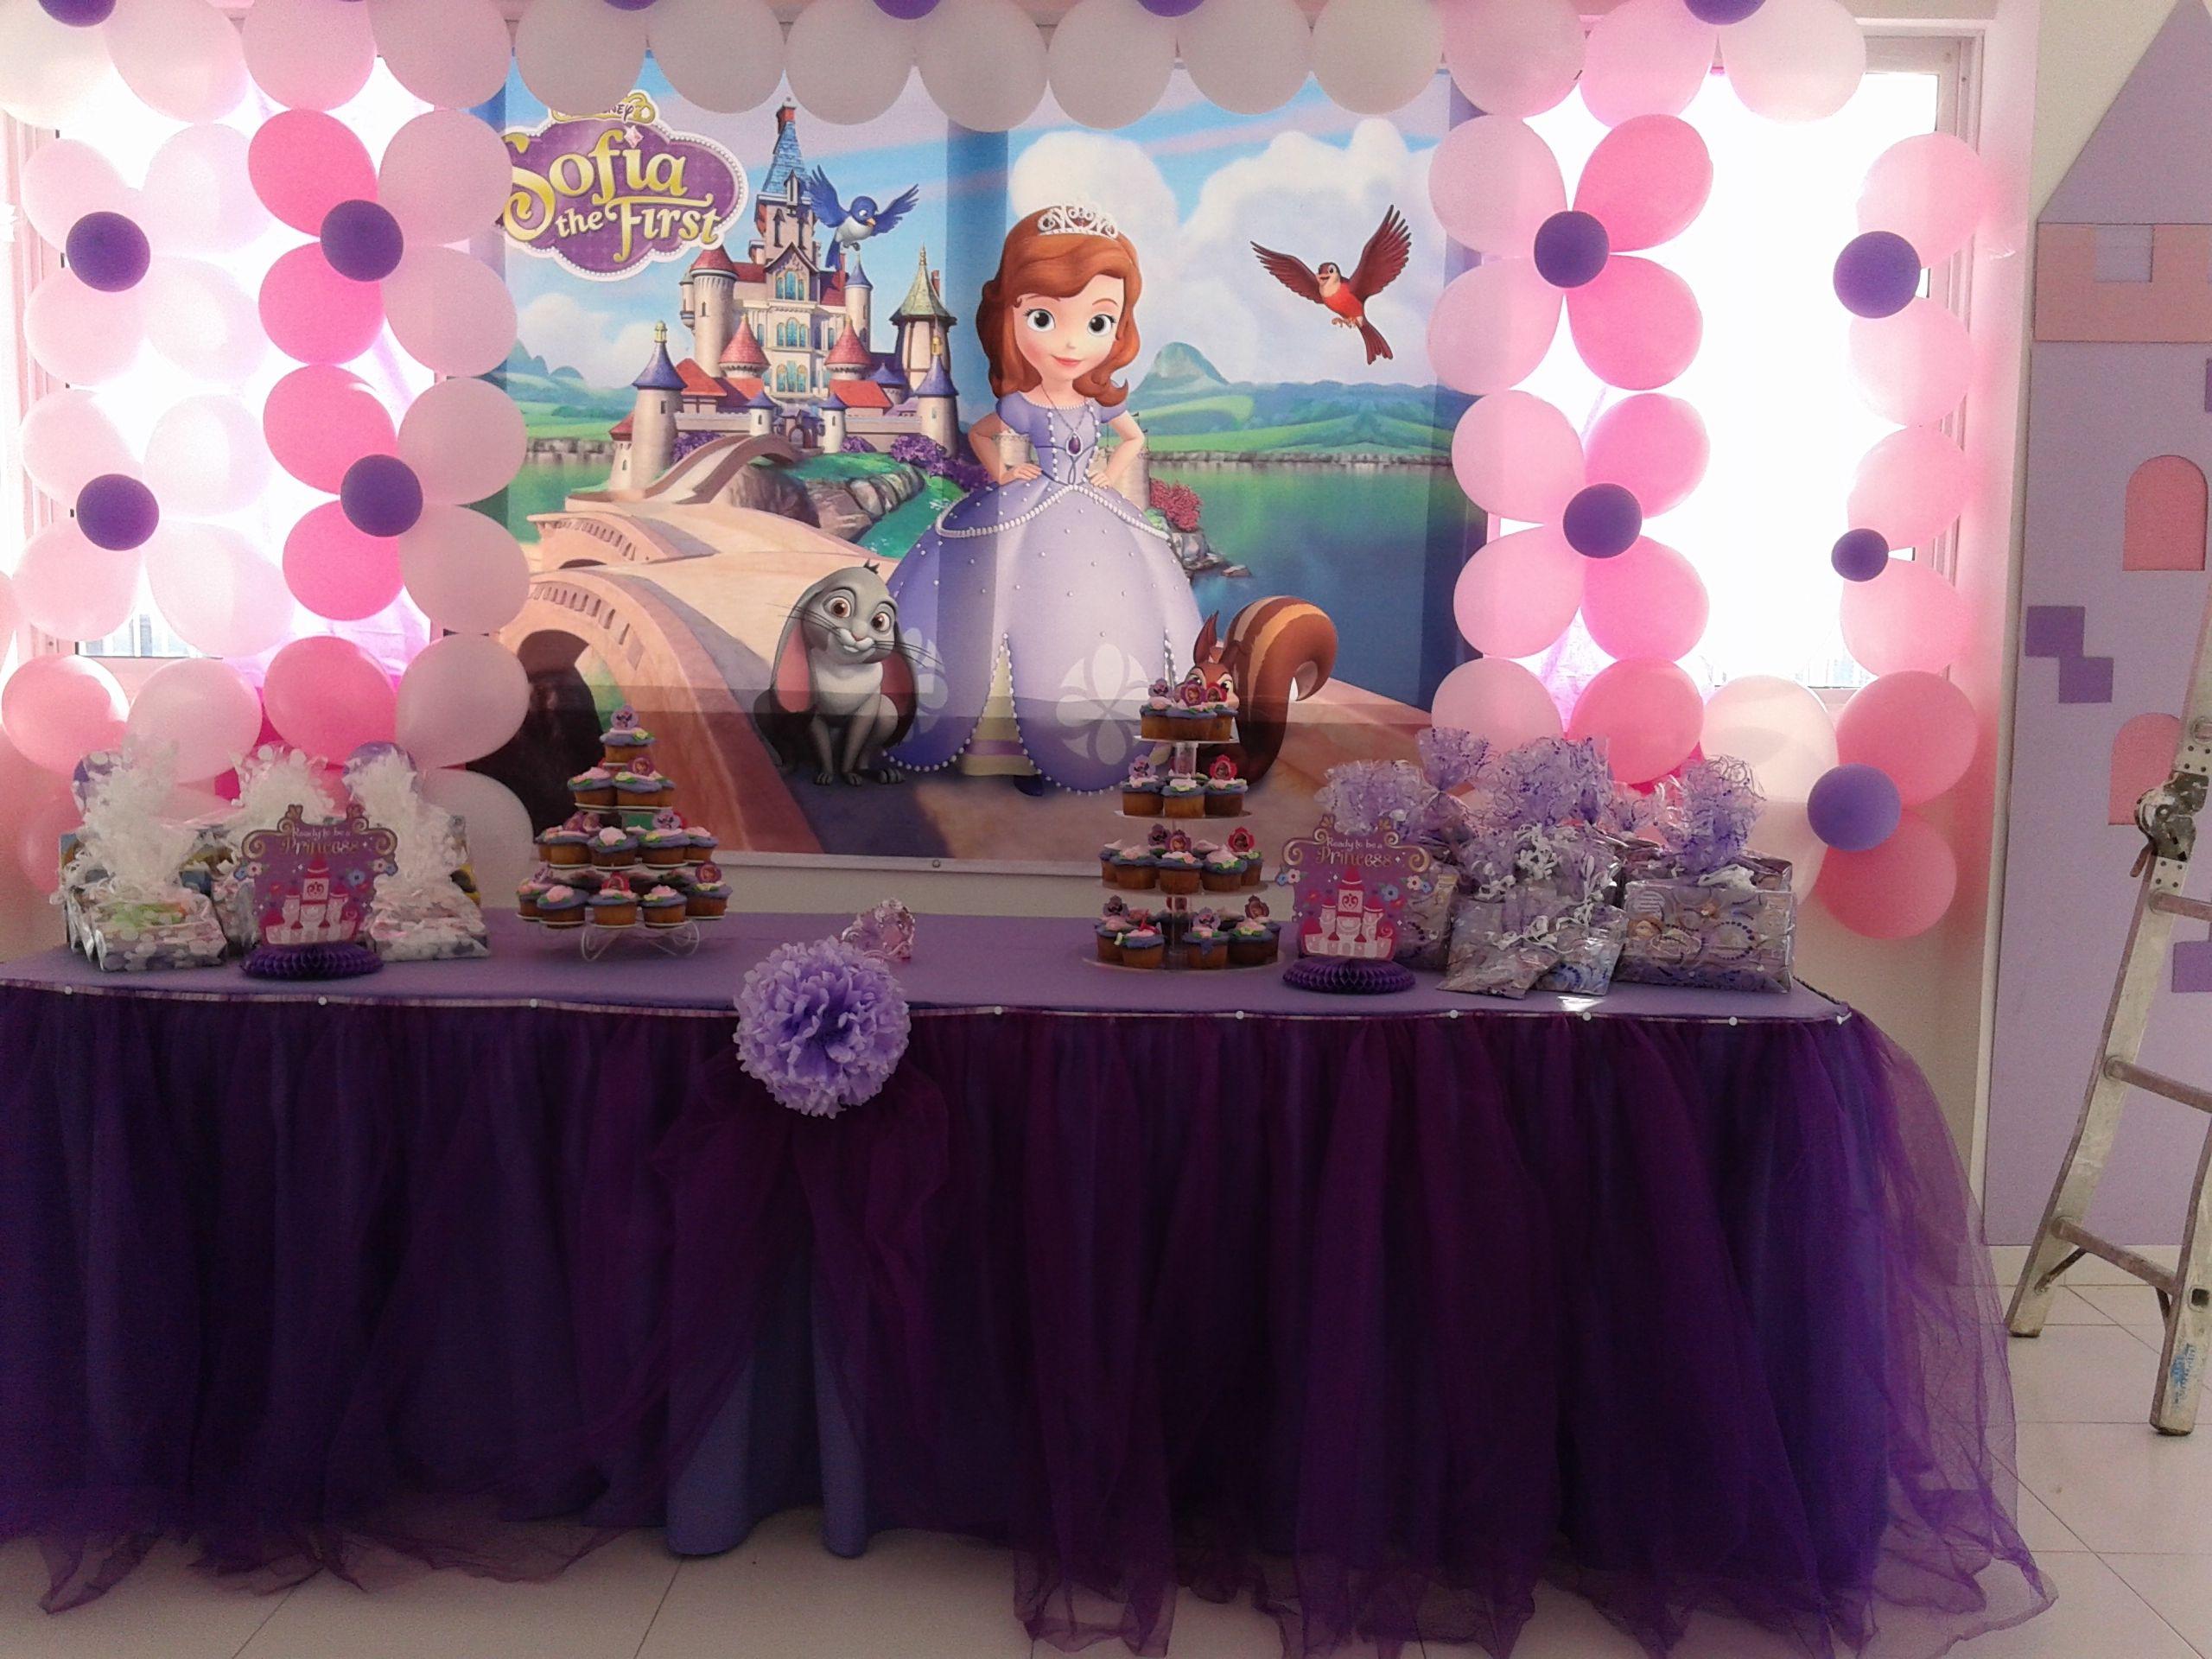 Decoracion fiesta infantil princesita sofia pinterest - Decoracion fiesta infantil ...